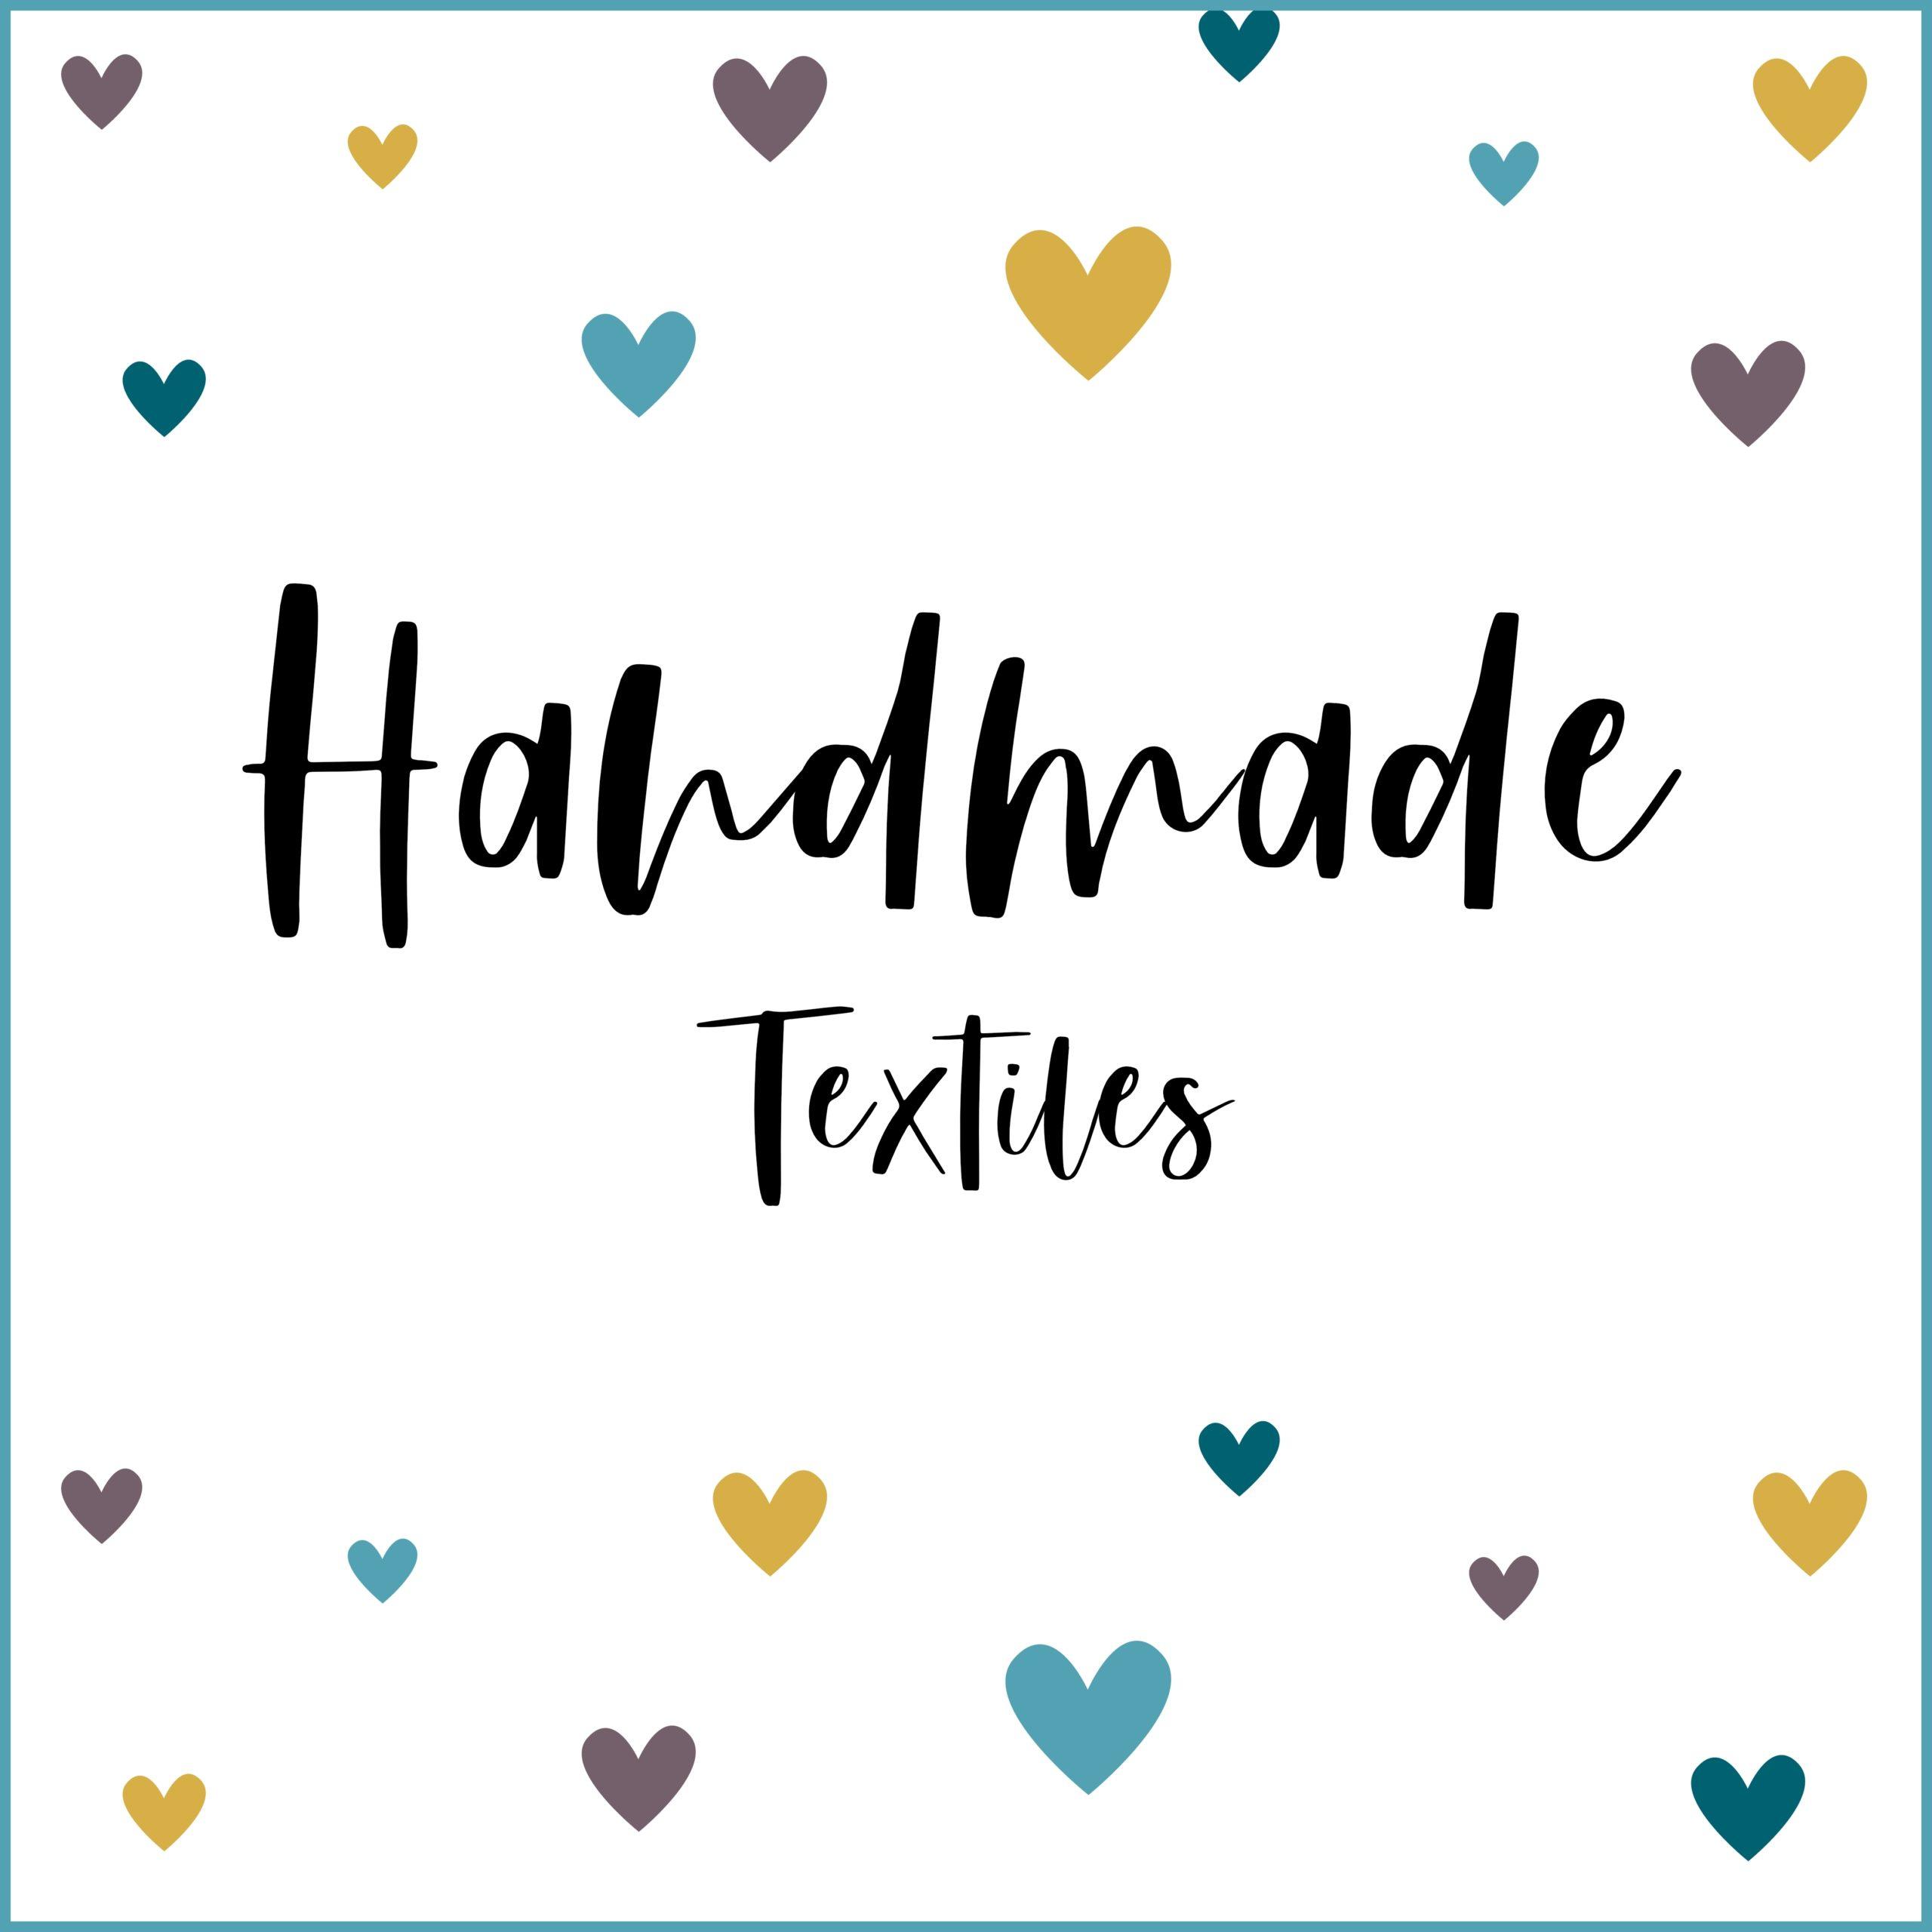 Handmade – Textiles